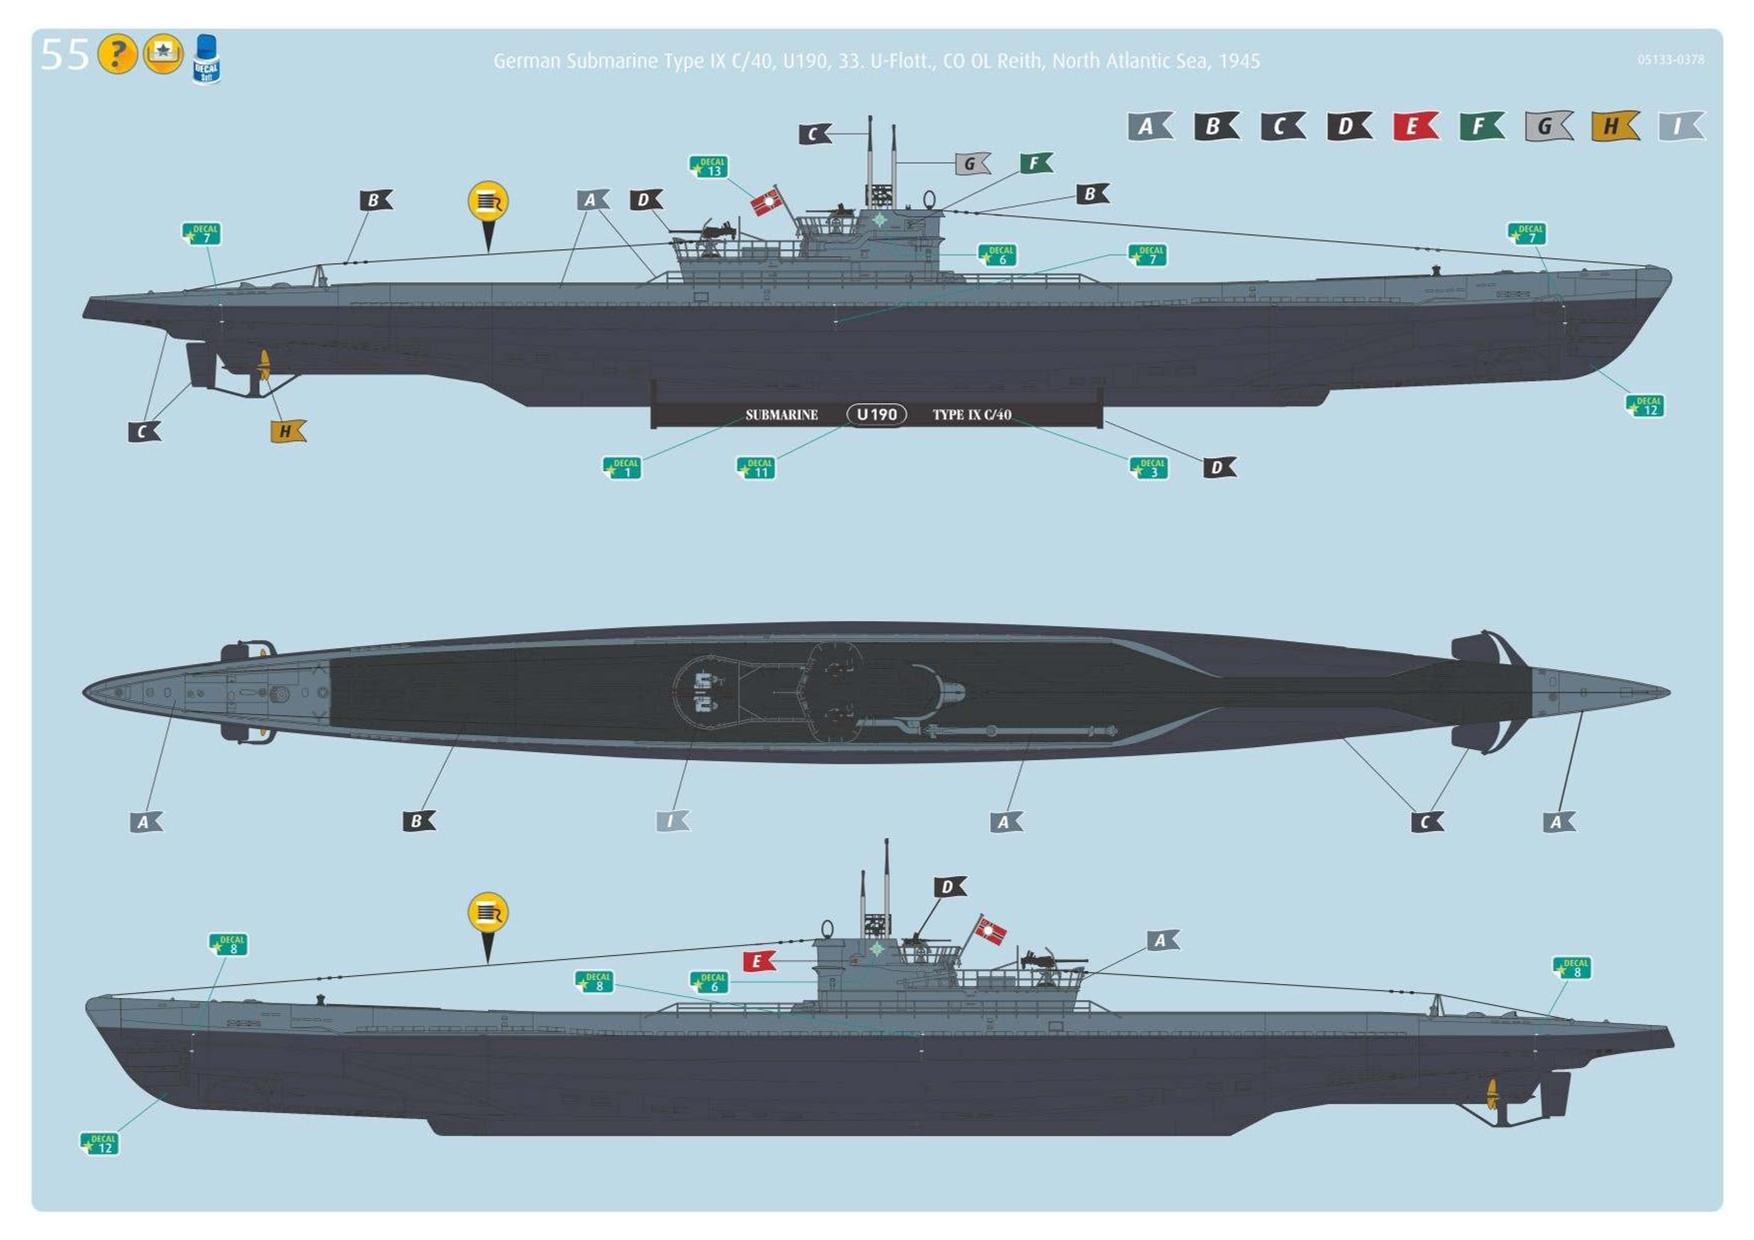 Revell U-Boot type IXC au 1/72ème 865563805133UbootIXcnouveau21